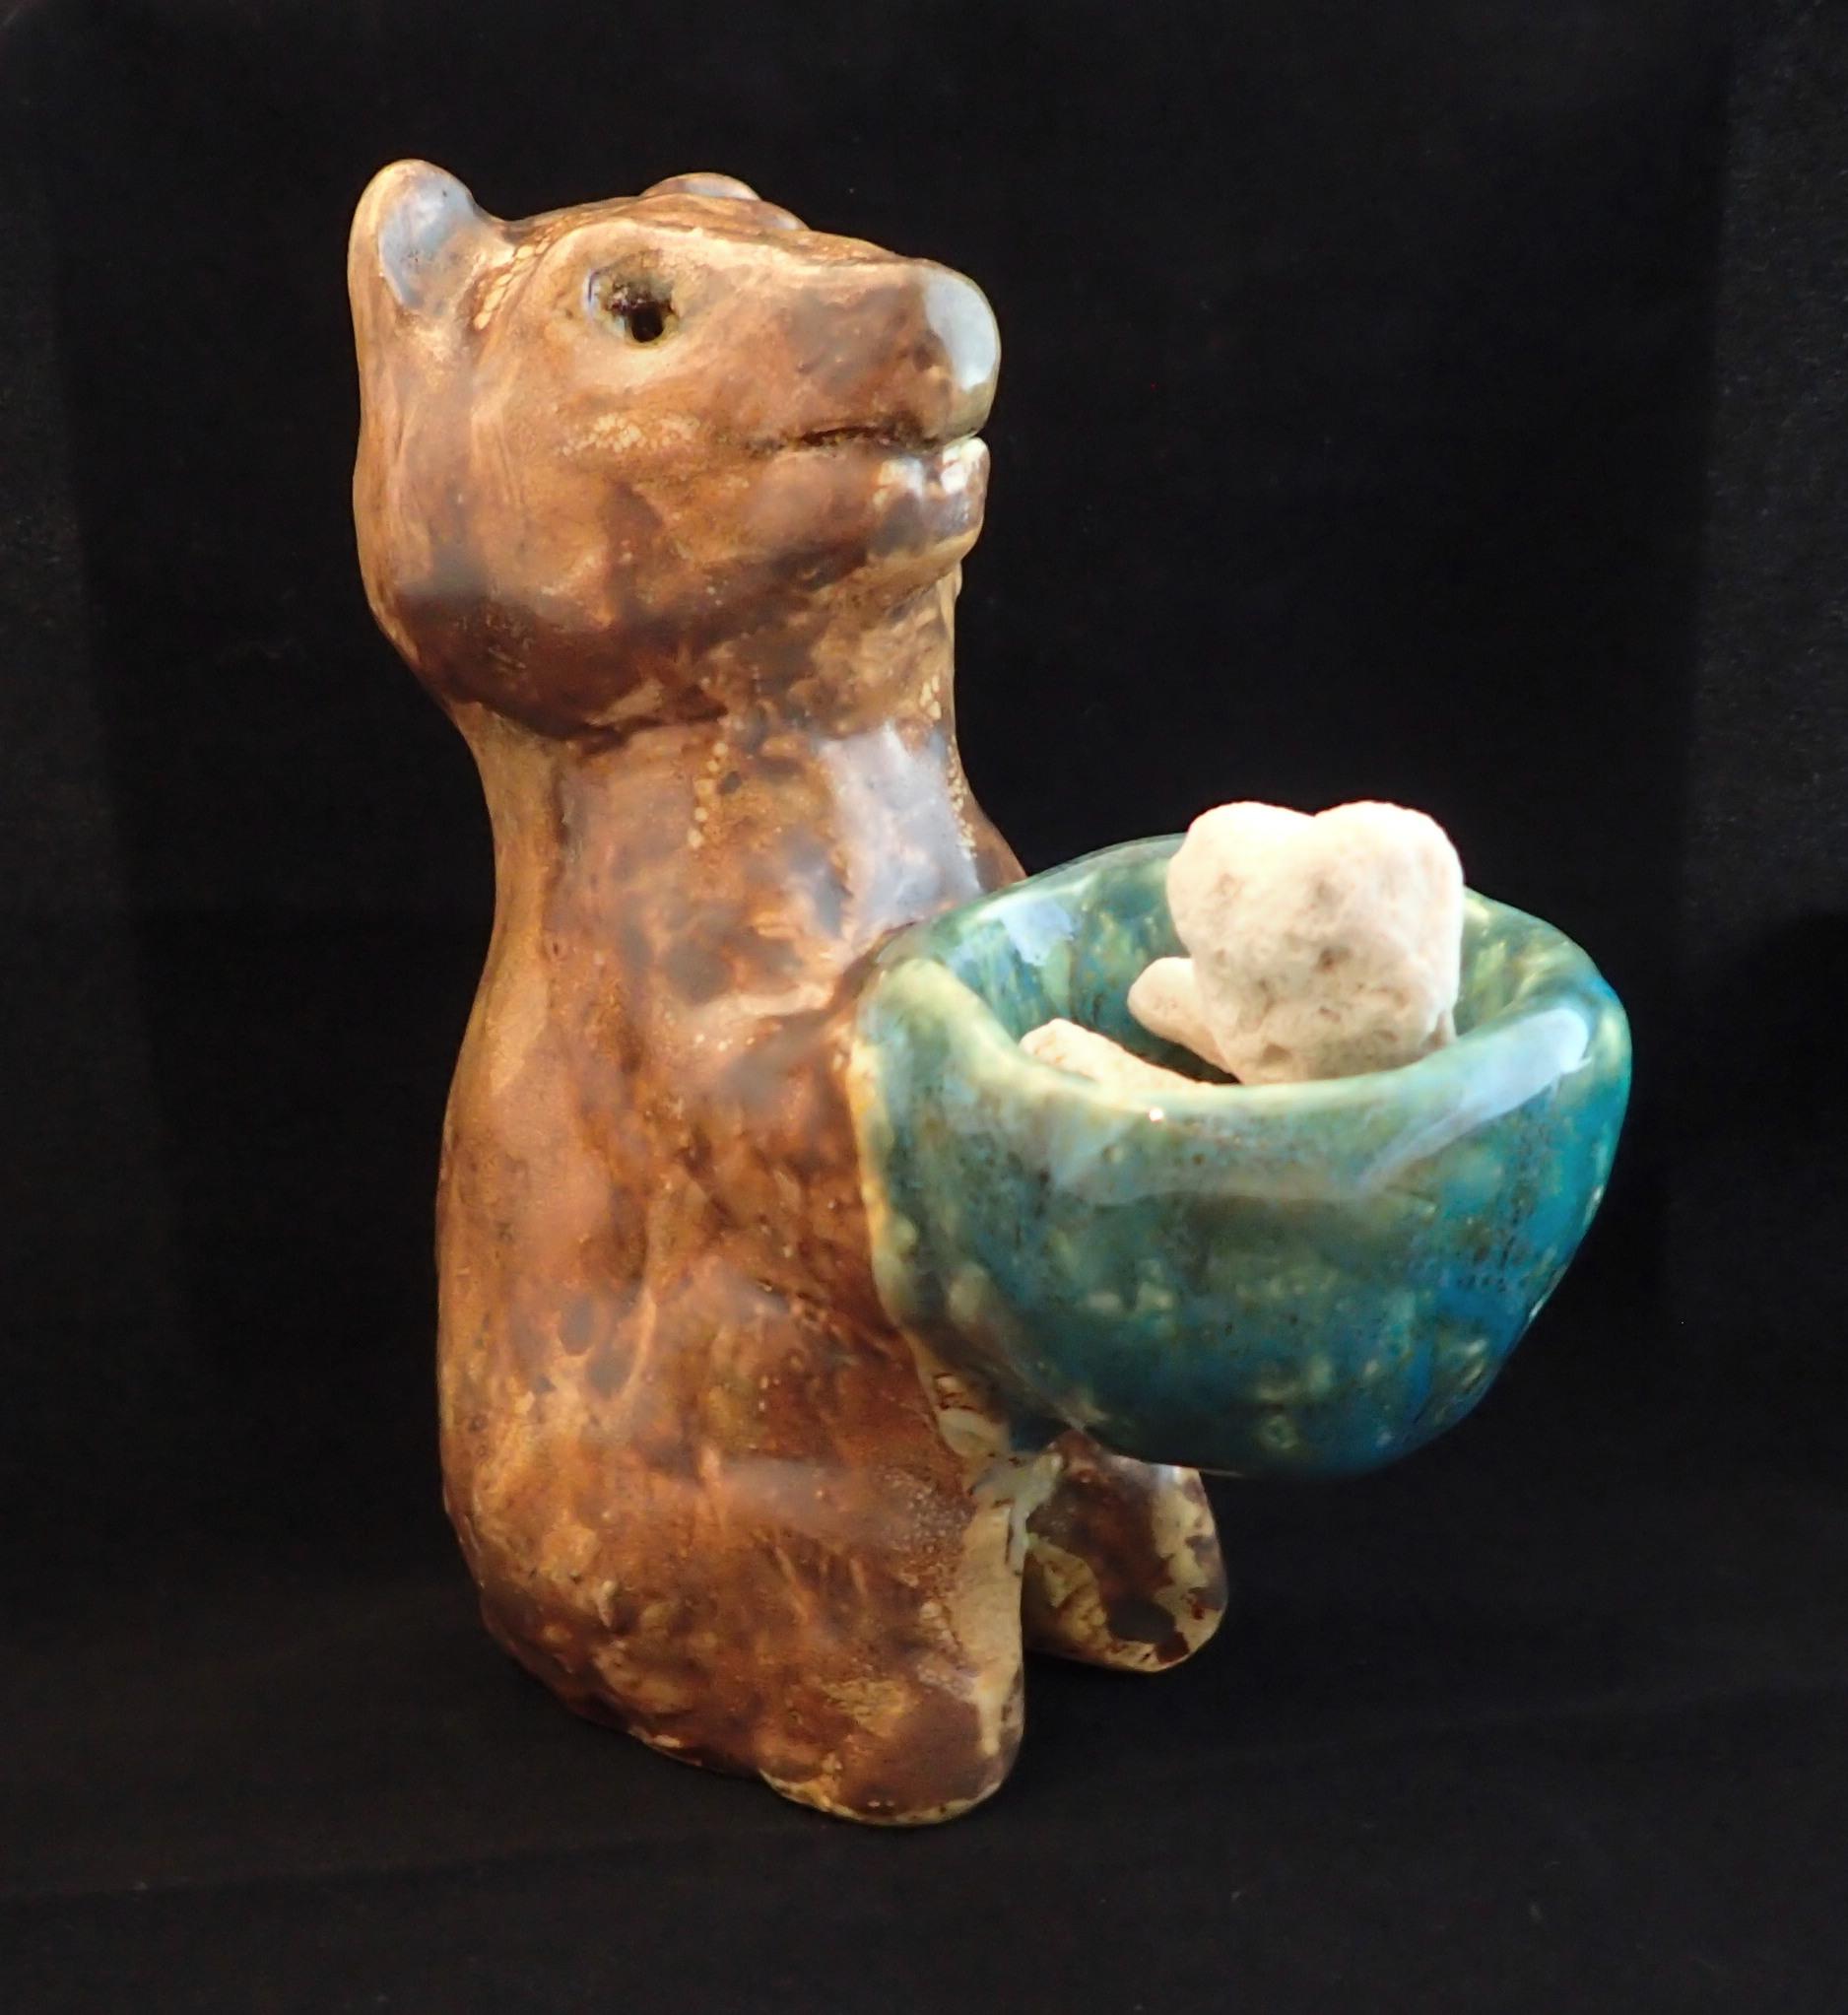 The Primitive Bear